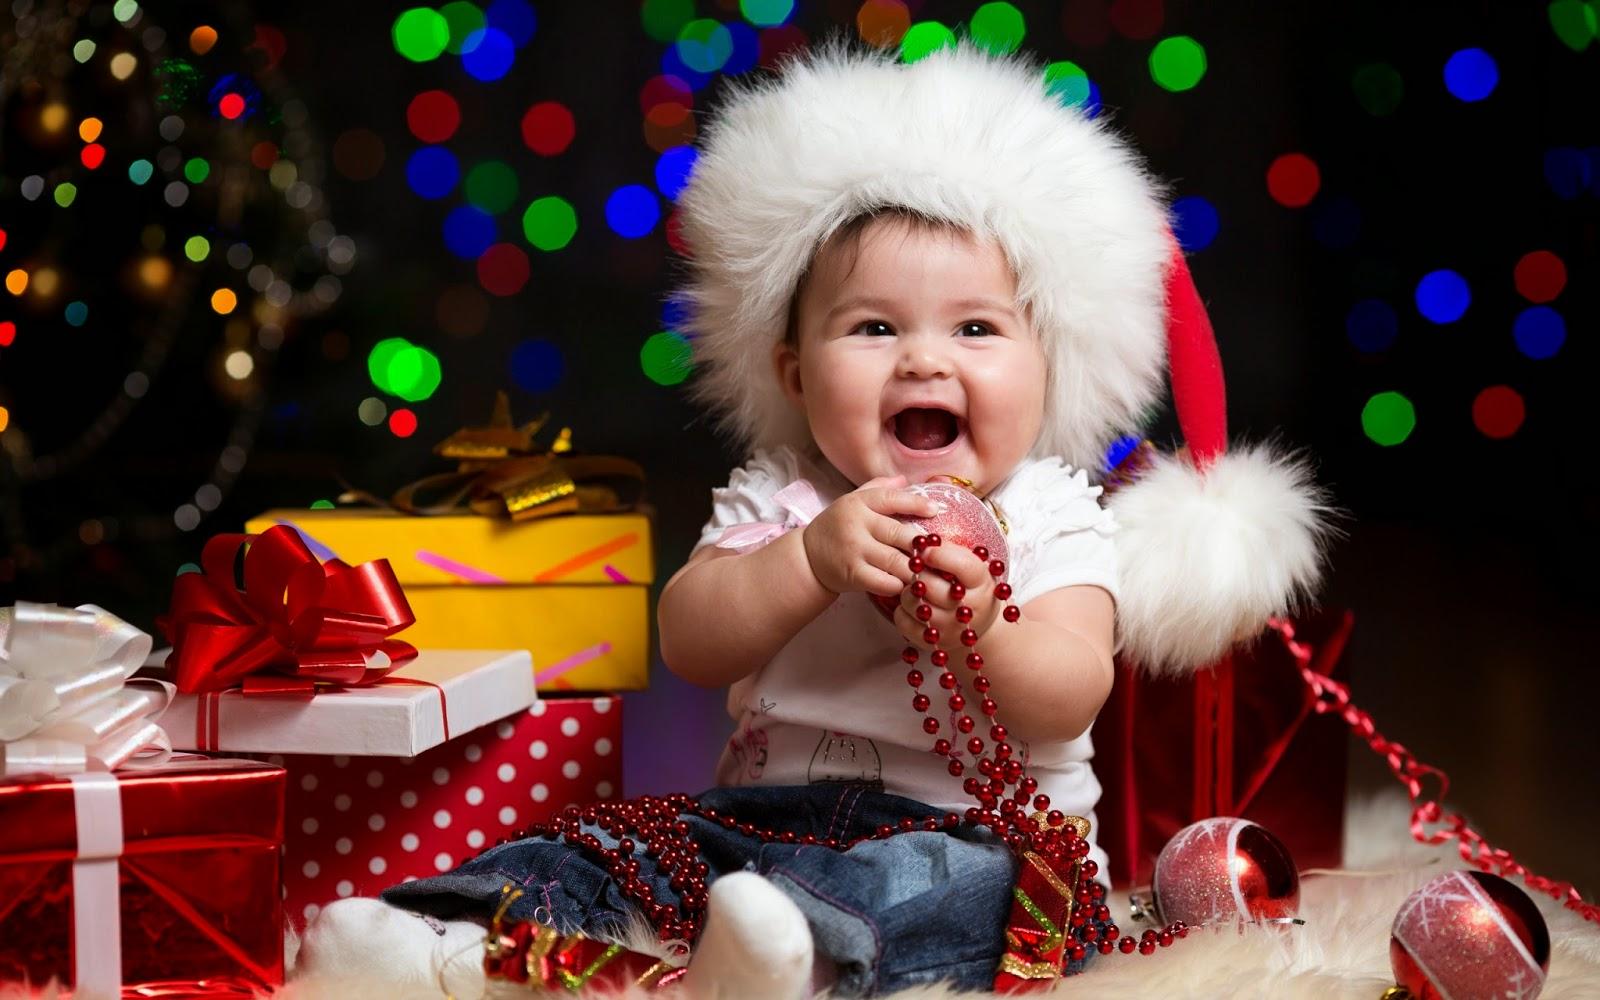 Gambar bayi lucu merayakan hari natal